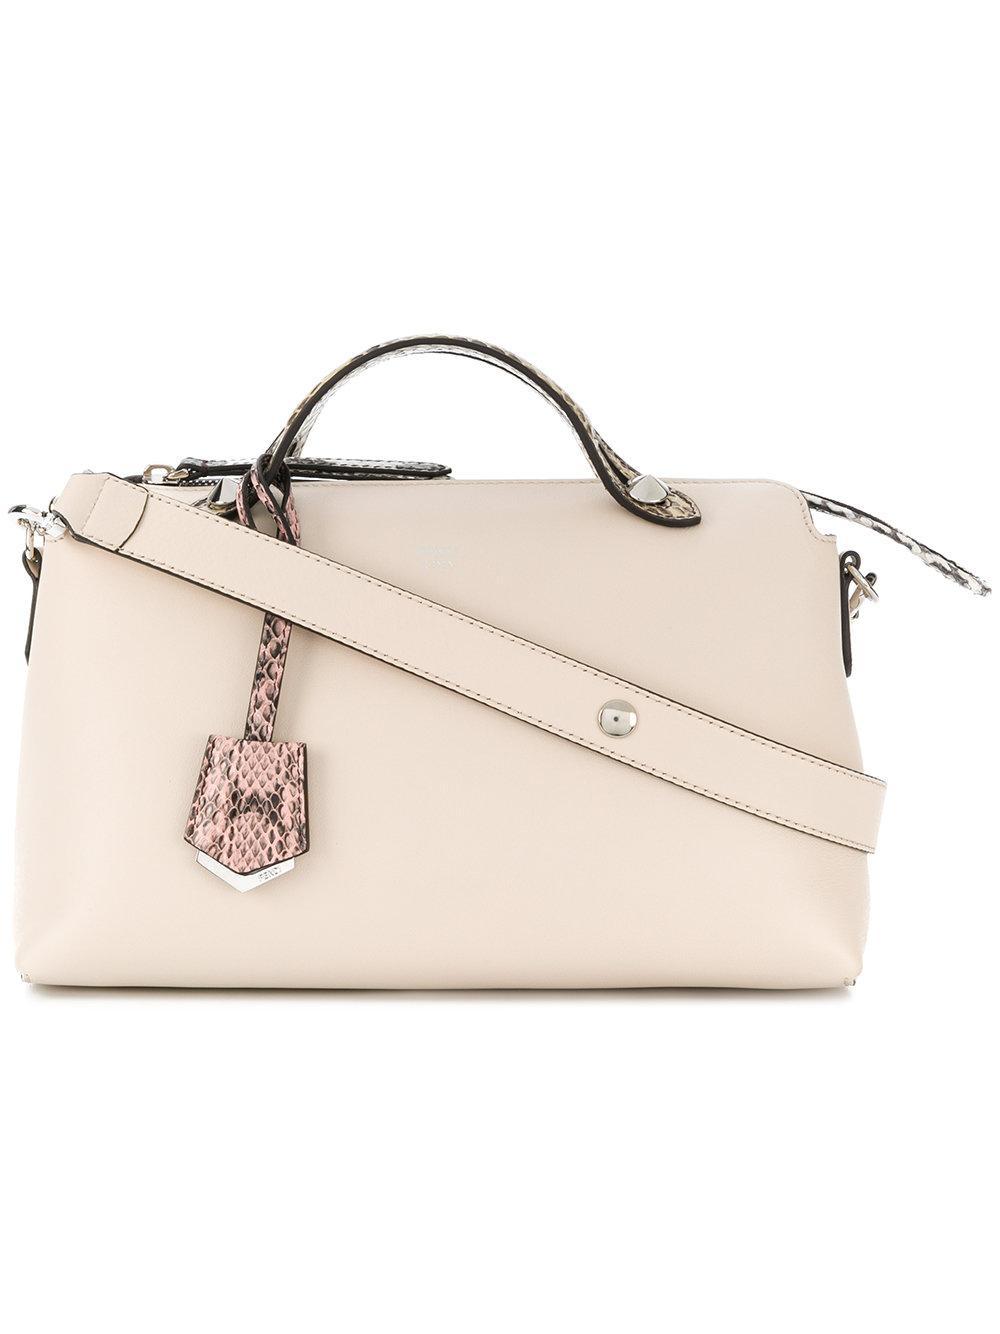 a59ac2dd437 Fendi By The Way Small Shoulder Bag - Cream In Neutrals | ModeSens